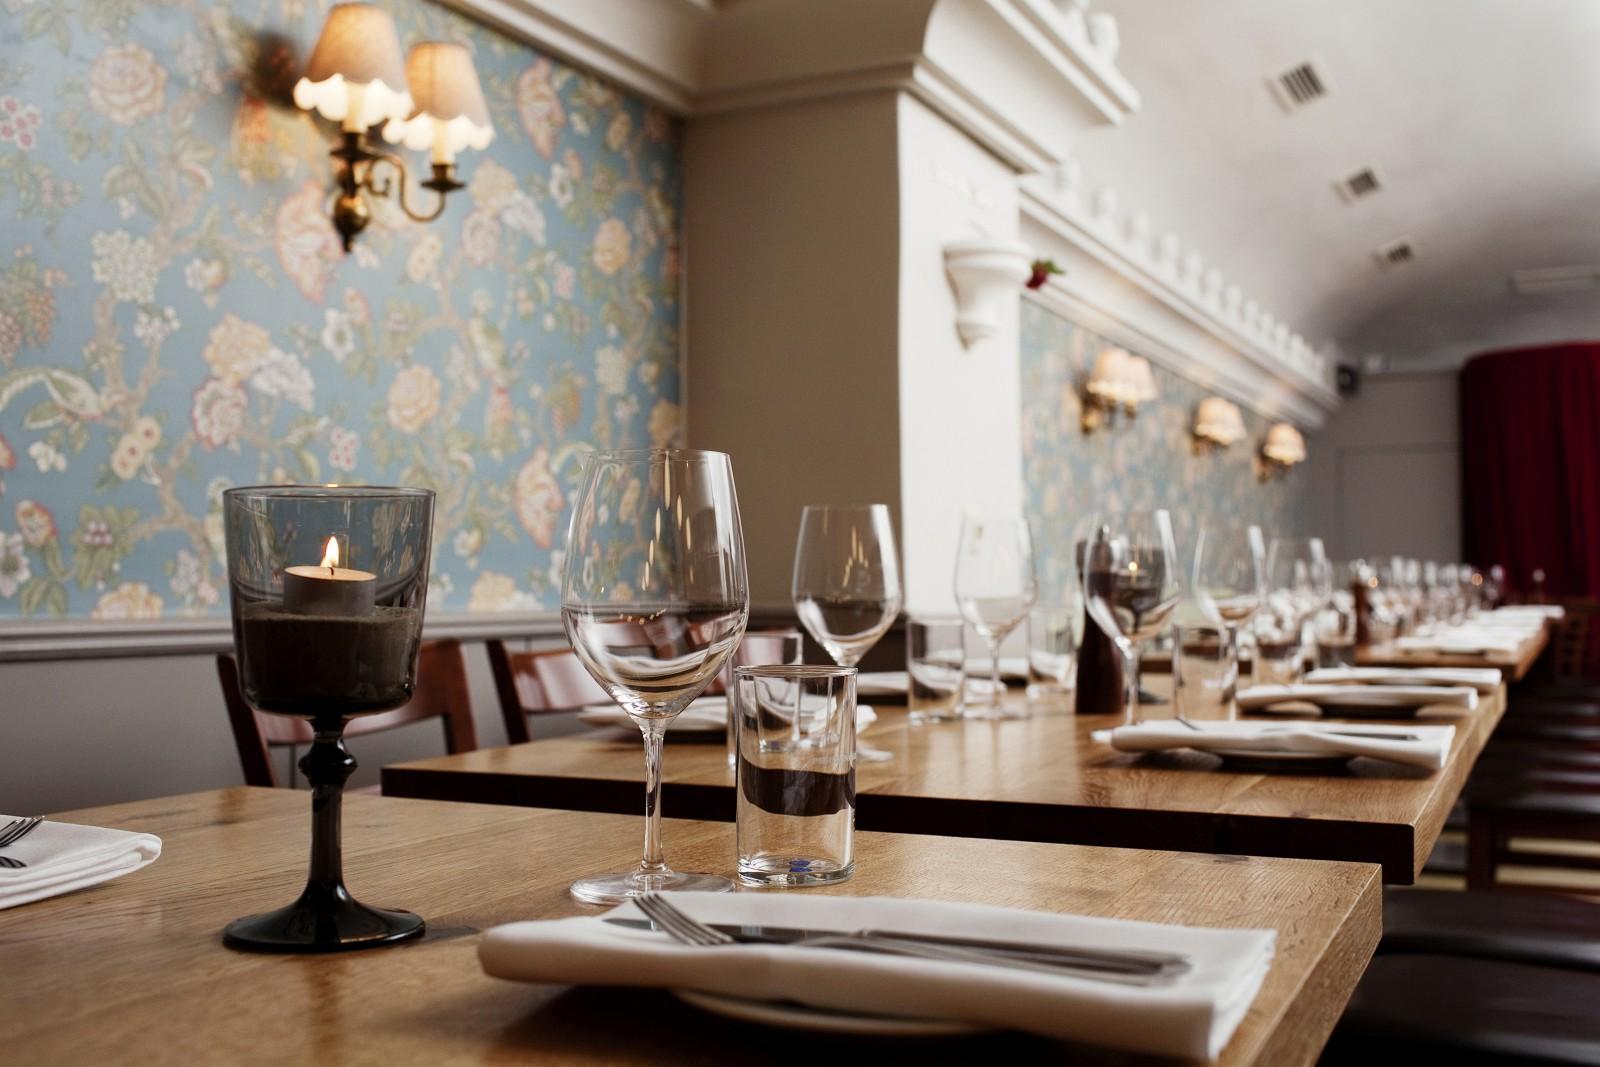 ottenthal restaurant weinhandlung in berlin